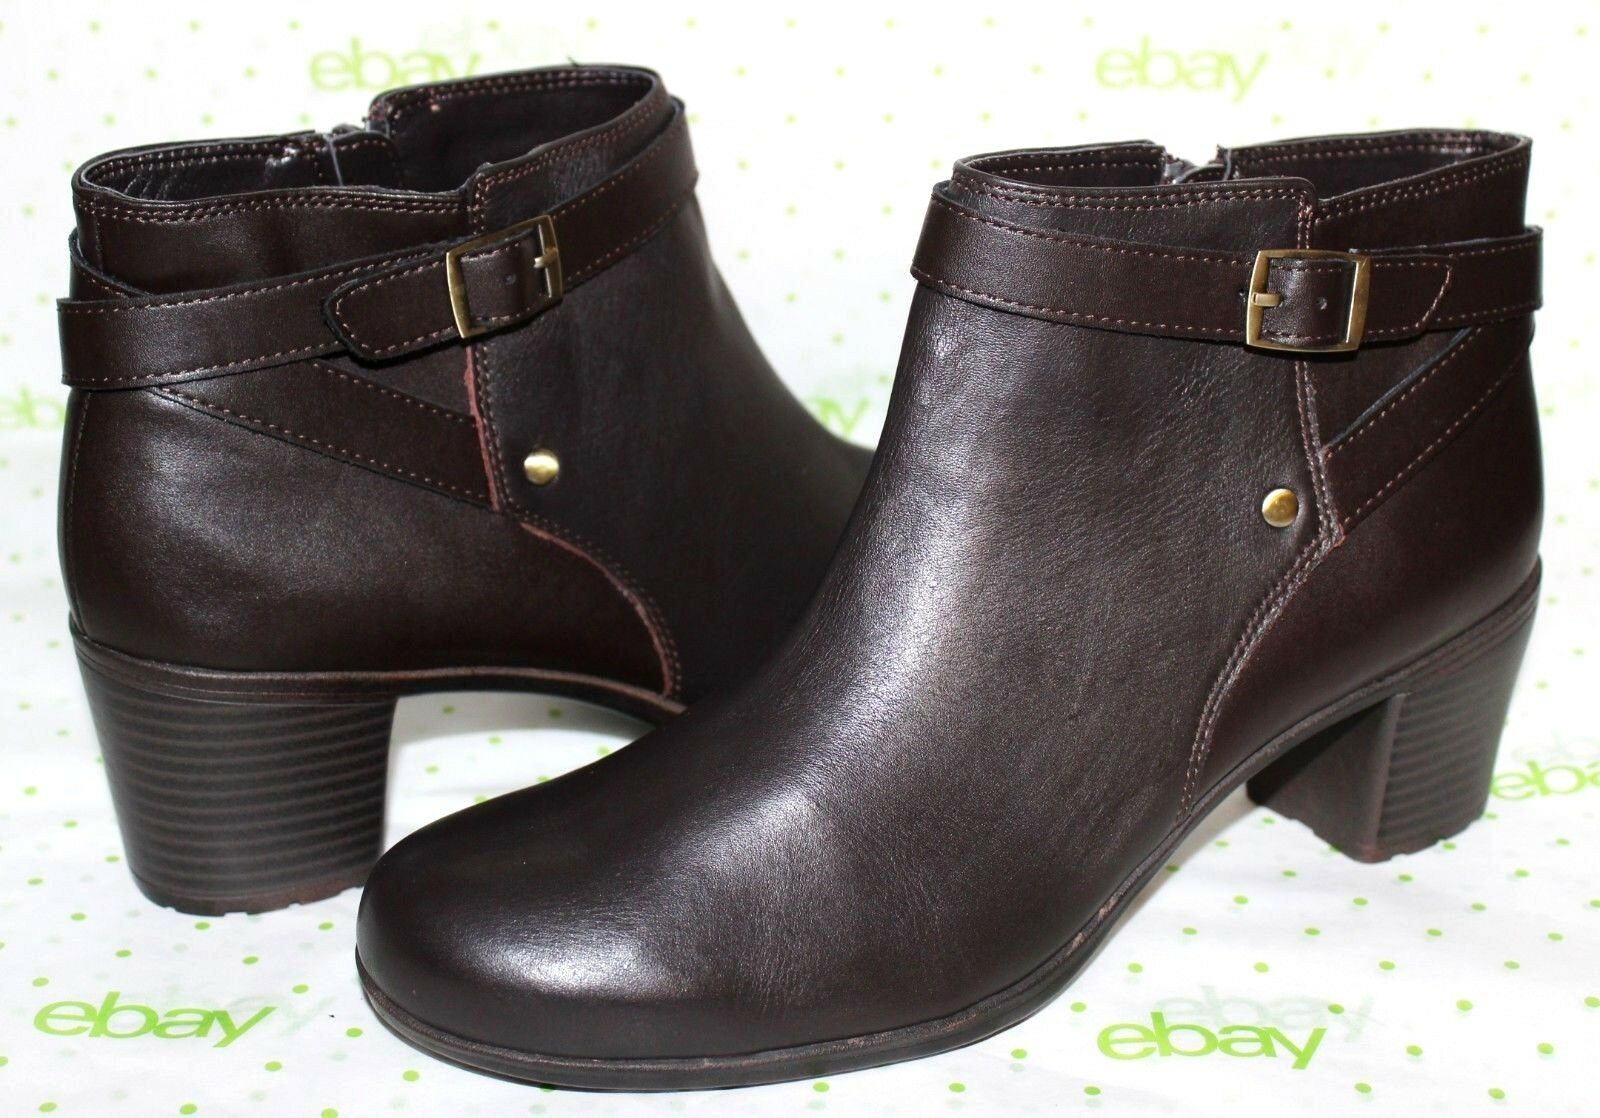 ✿ EASY SPIRIT Zip Adino Espresso Genuine Leder Zip SPIRIT Ankle Stiefel 9.5 M NEW  L@@K 327676